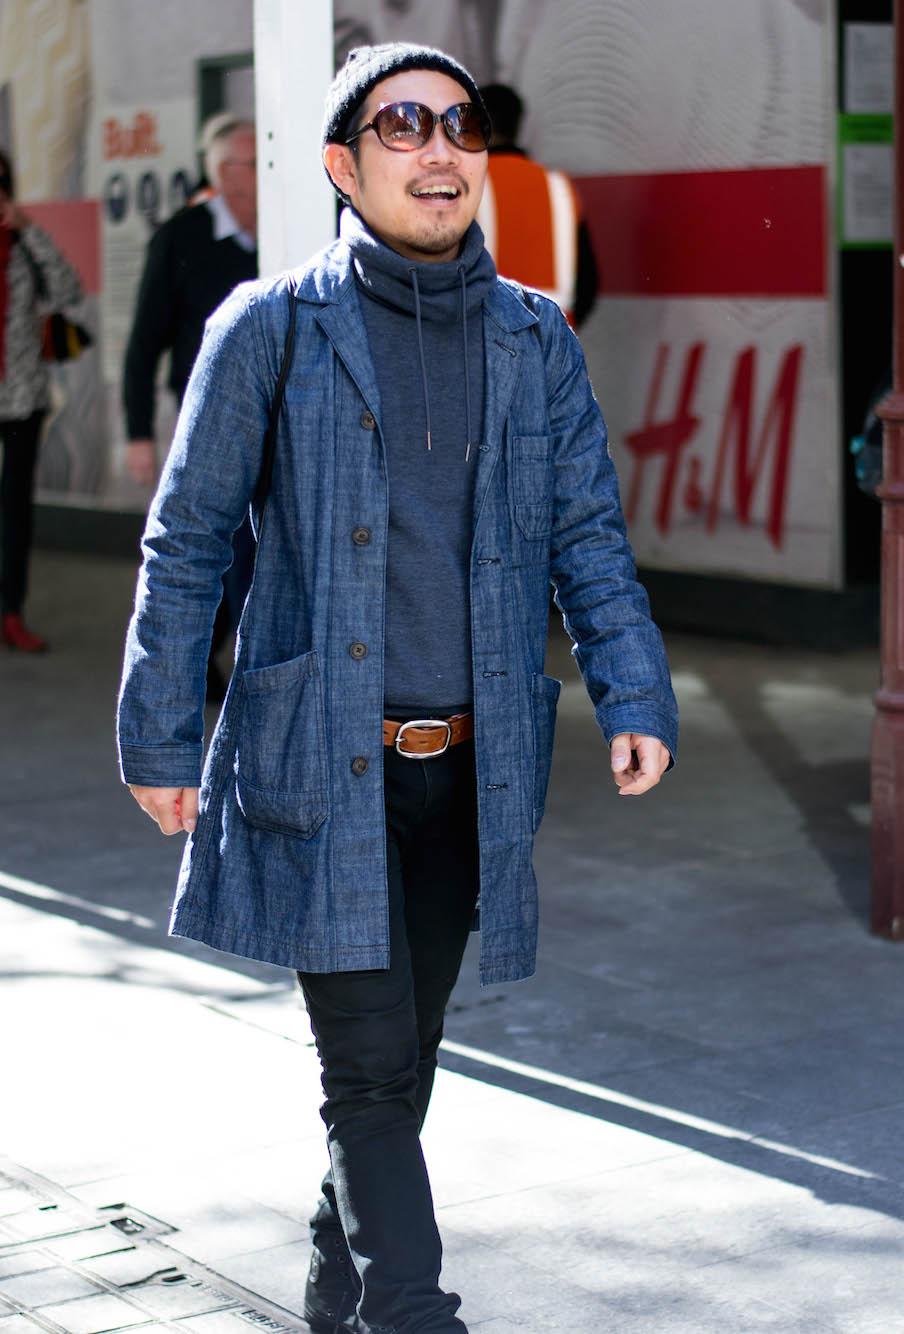 NSW: Hiroyuki Ono, hairdresser, Pitt St. Photo: Alice Scriberras